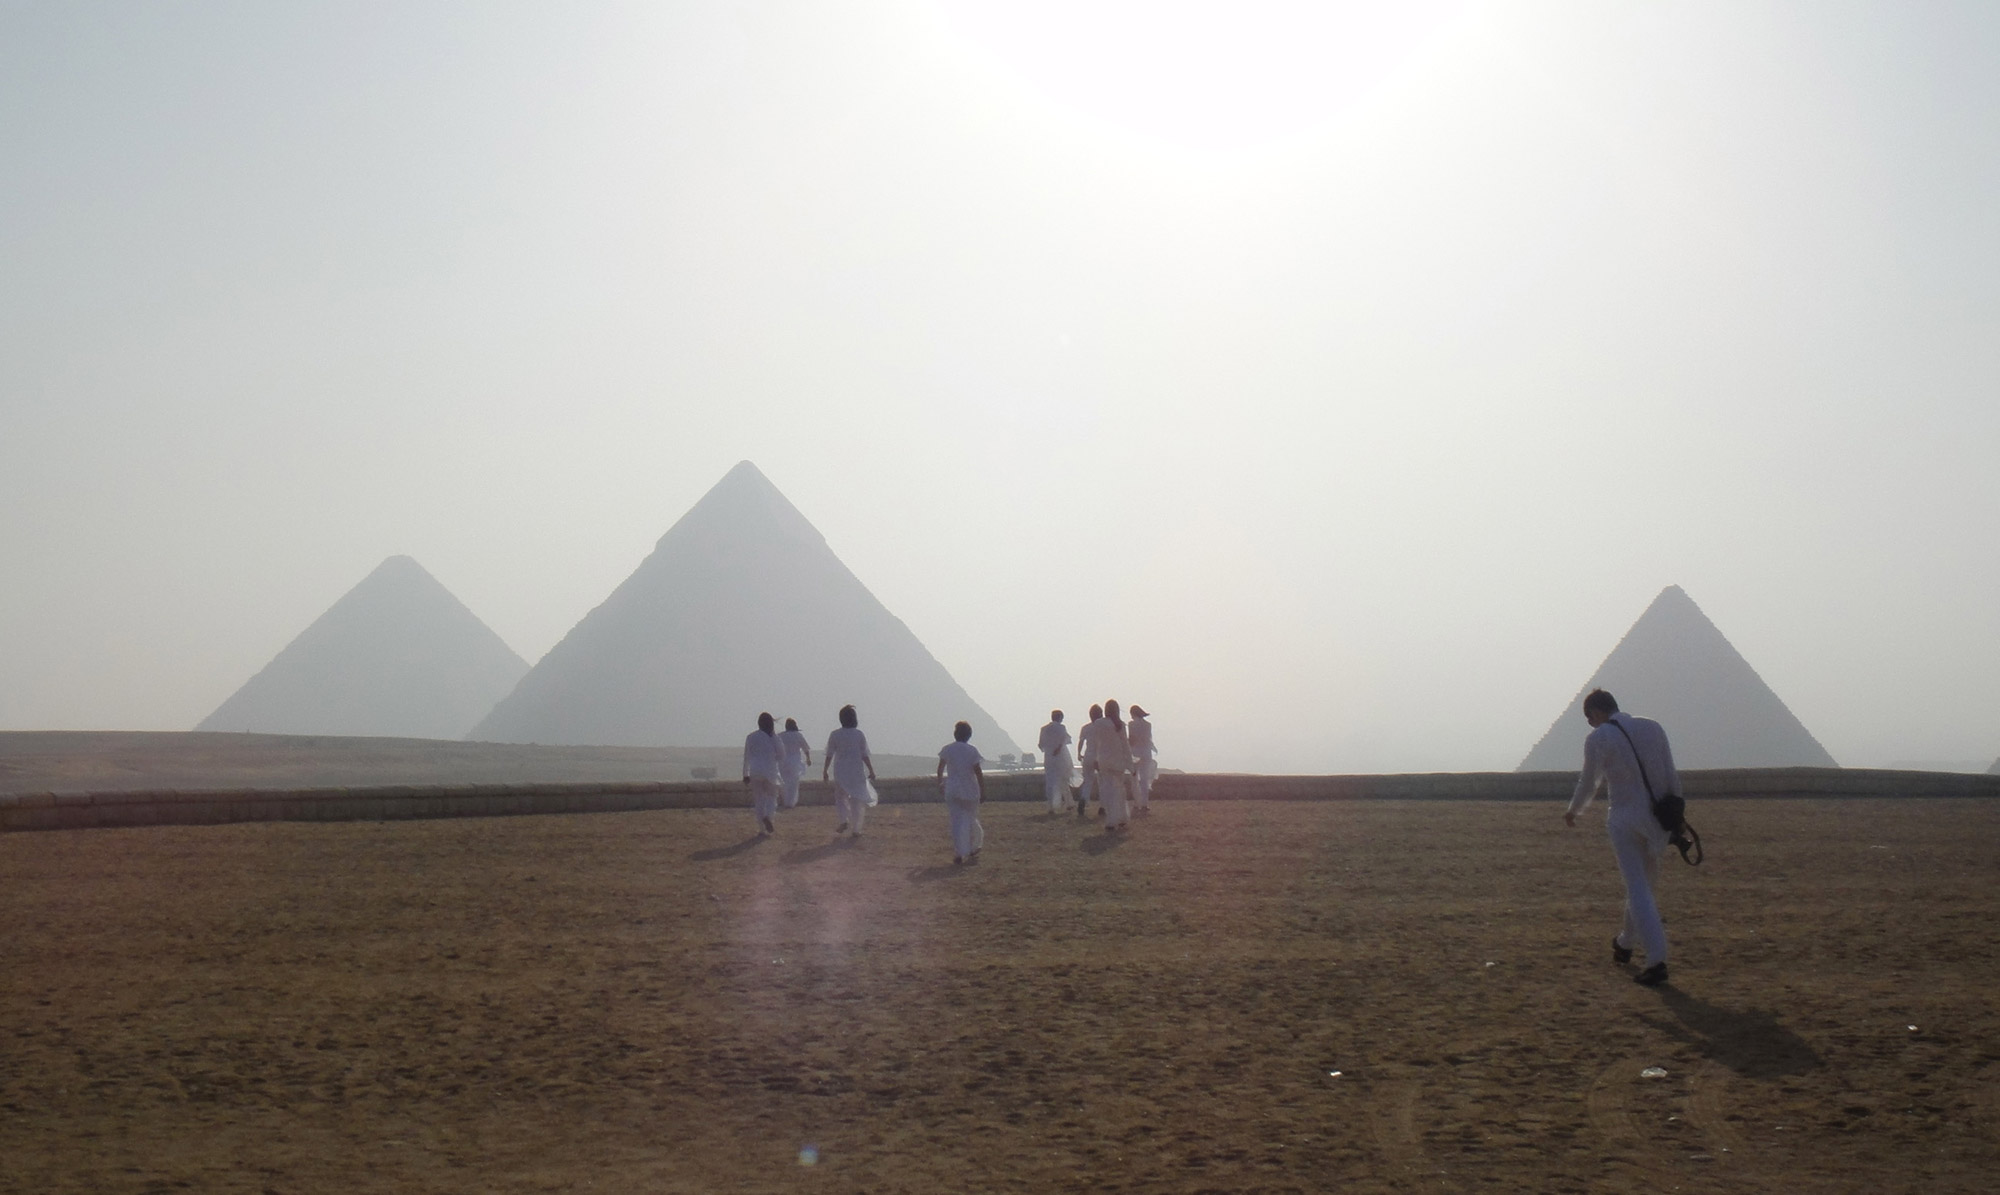 Egypt, Giza Plateau